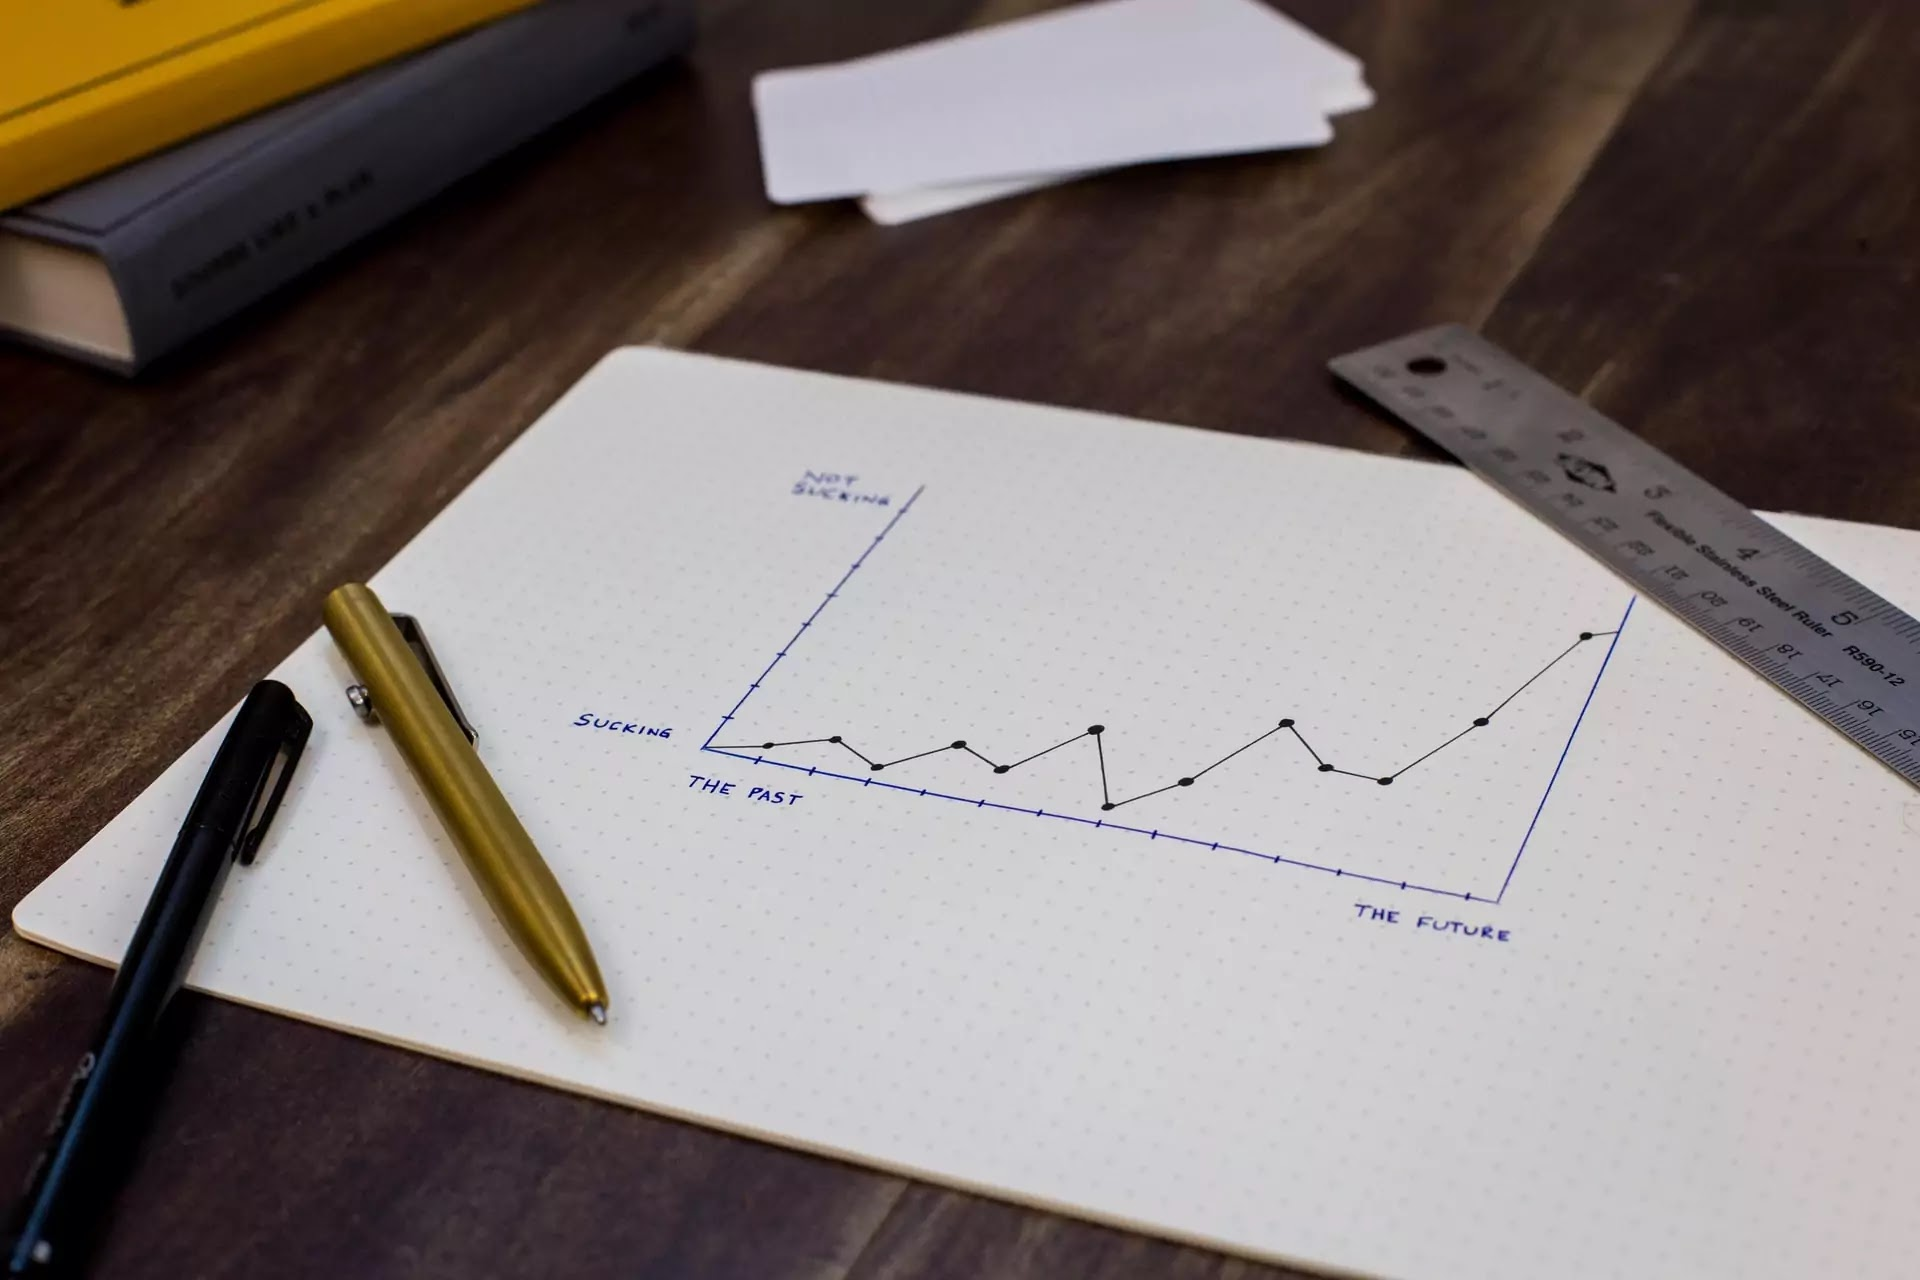 analytical image of drawing image recalls customer